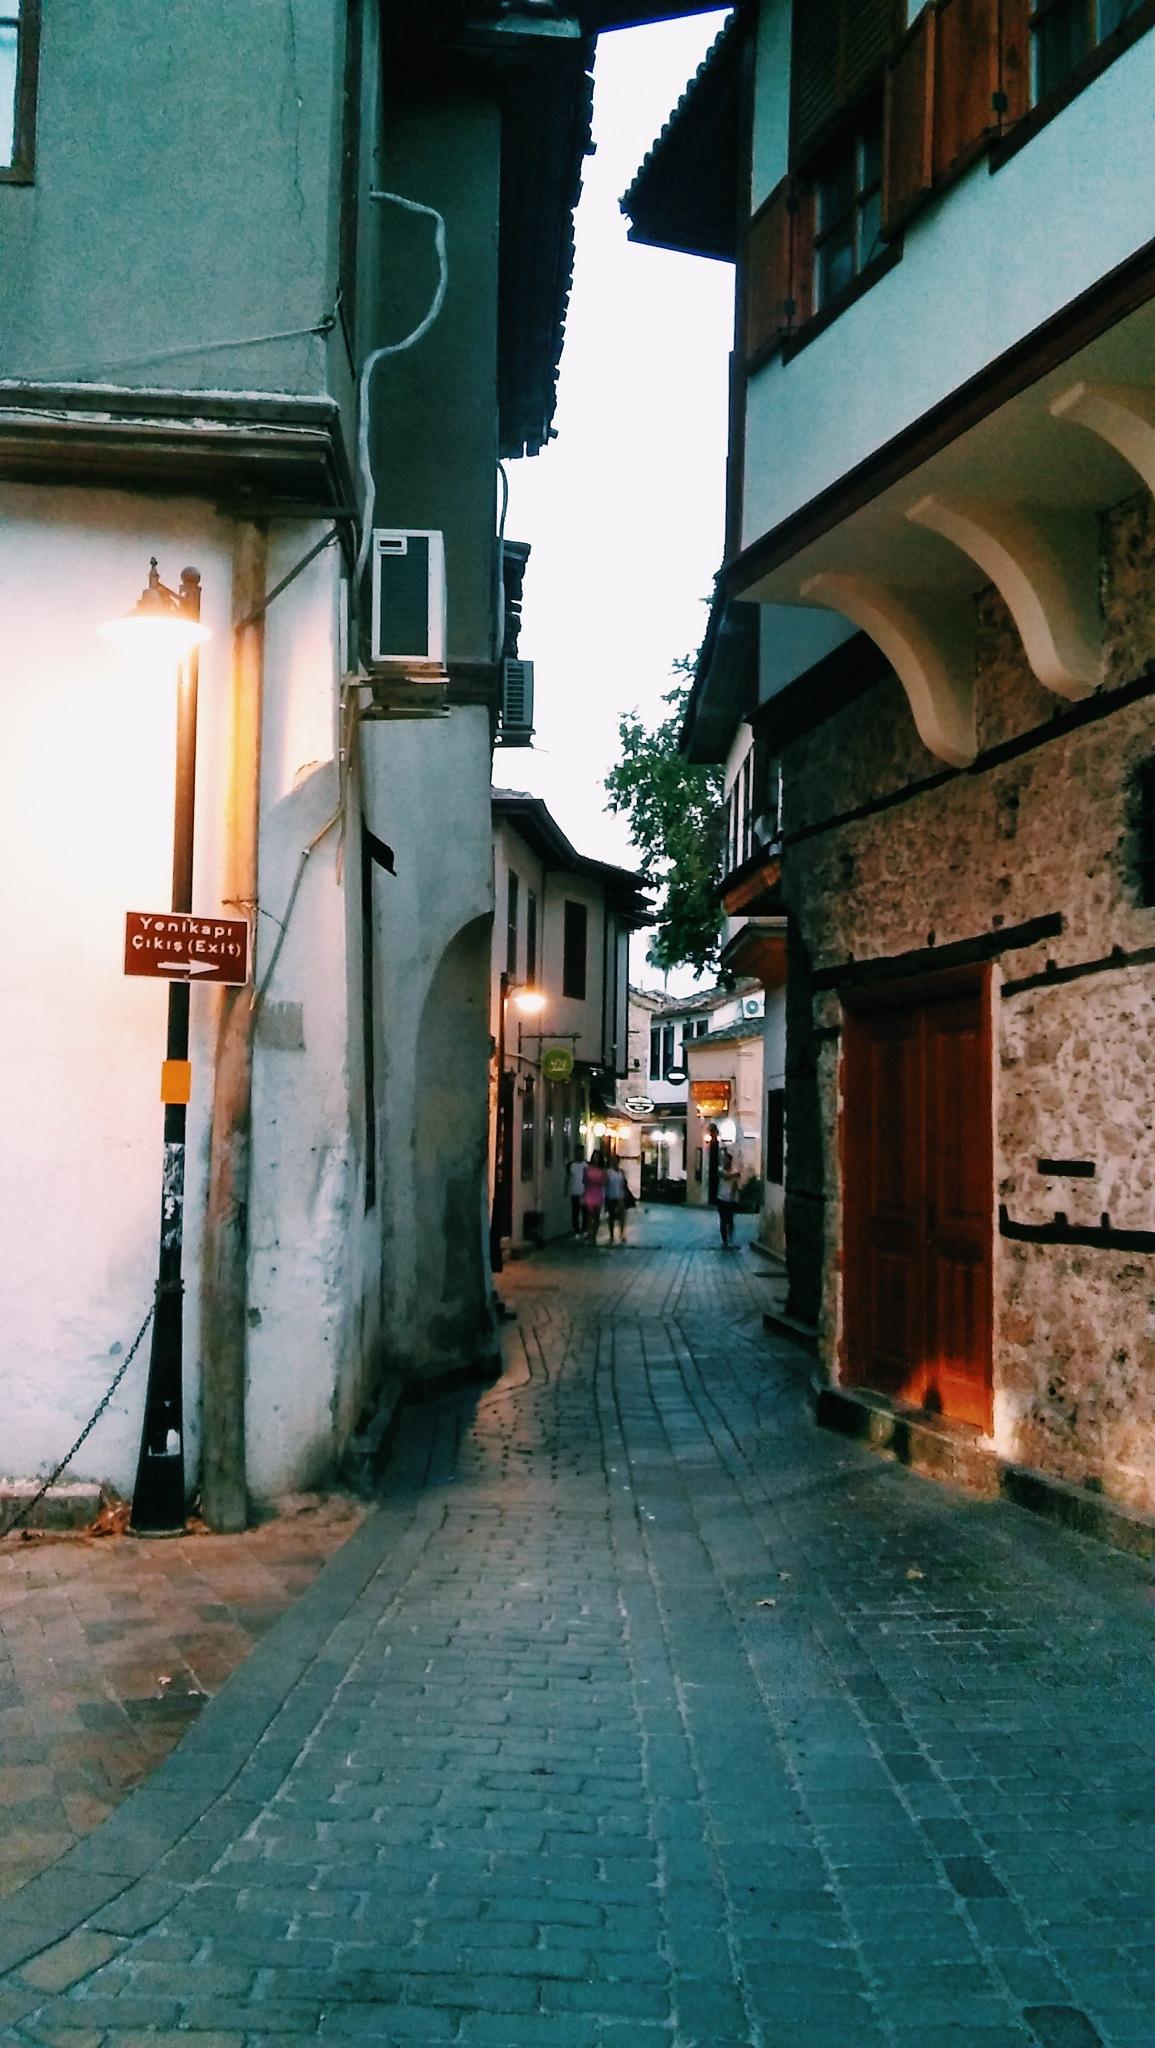 Antalya Sokakları by suleymanuguz